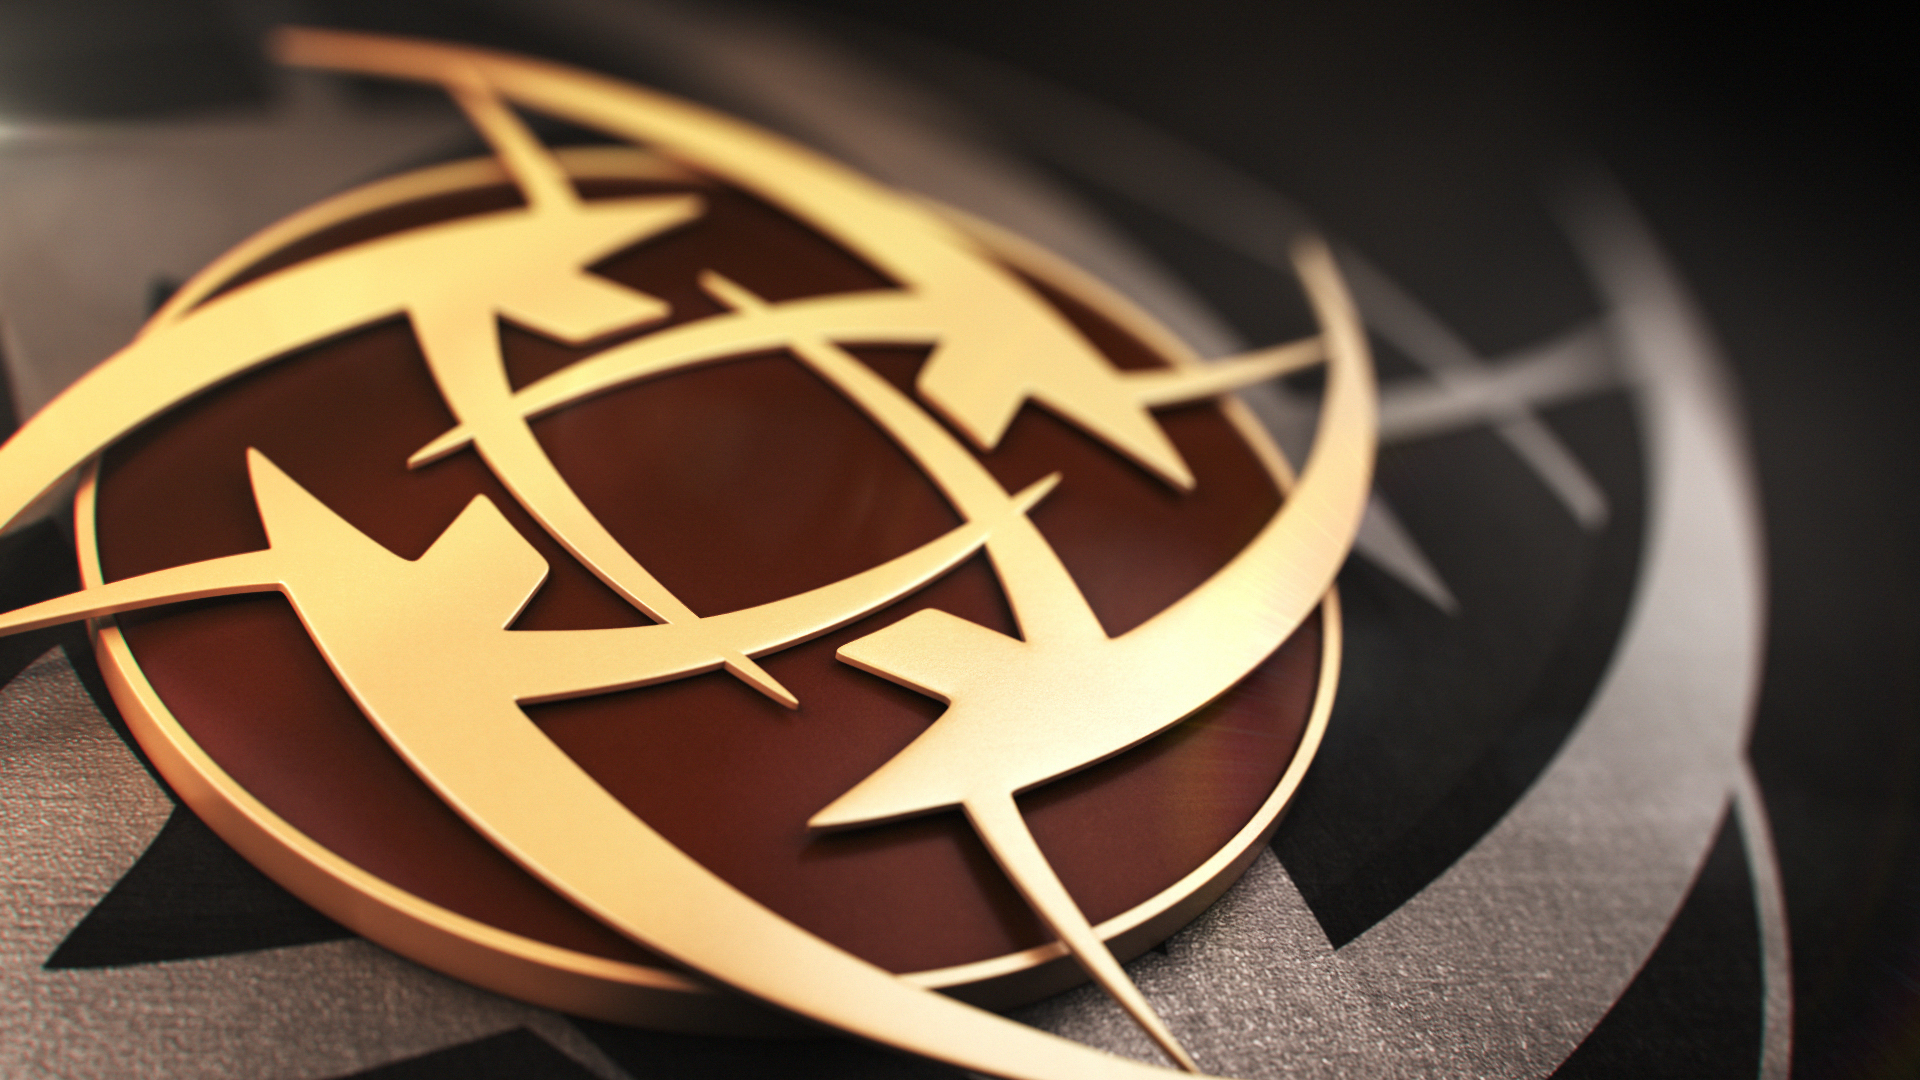 nip logo 2 3D